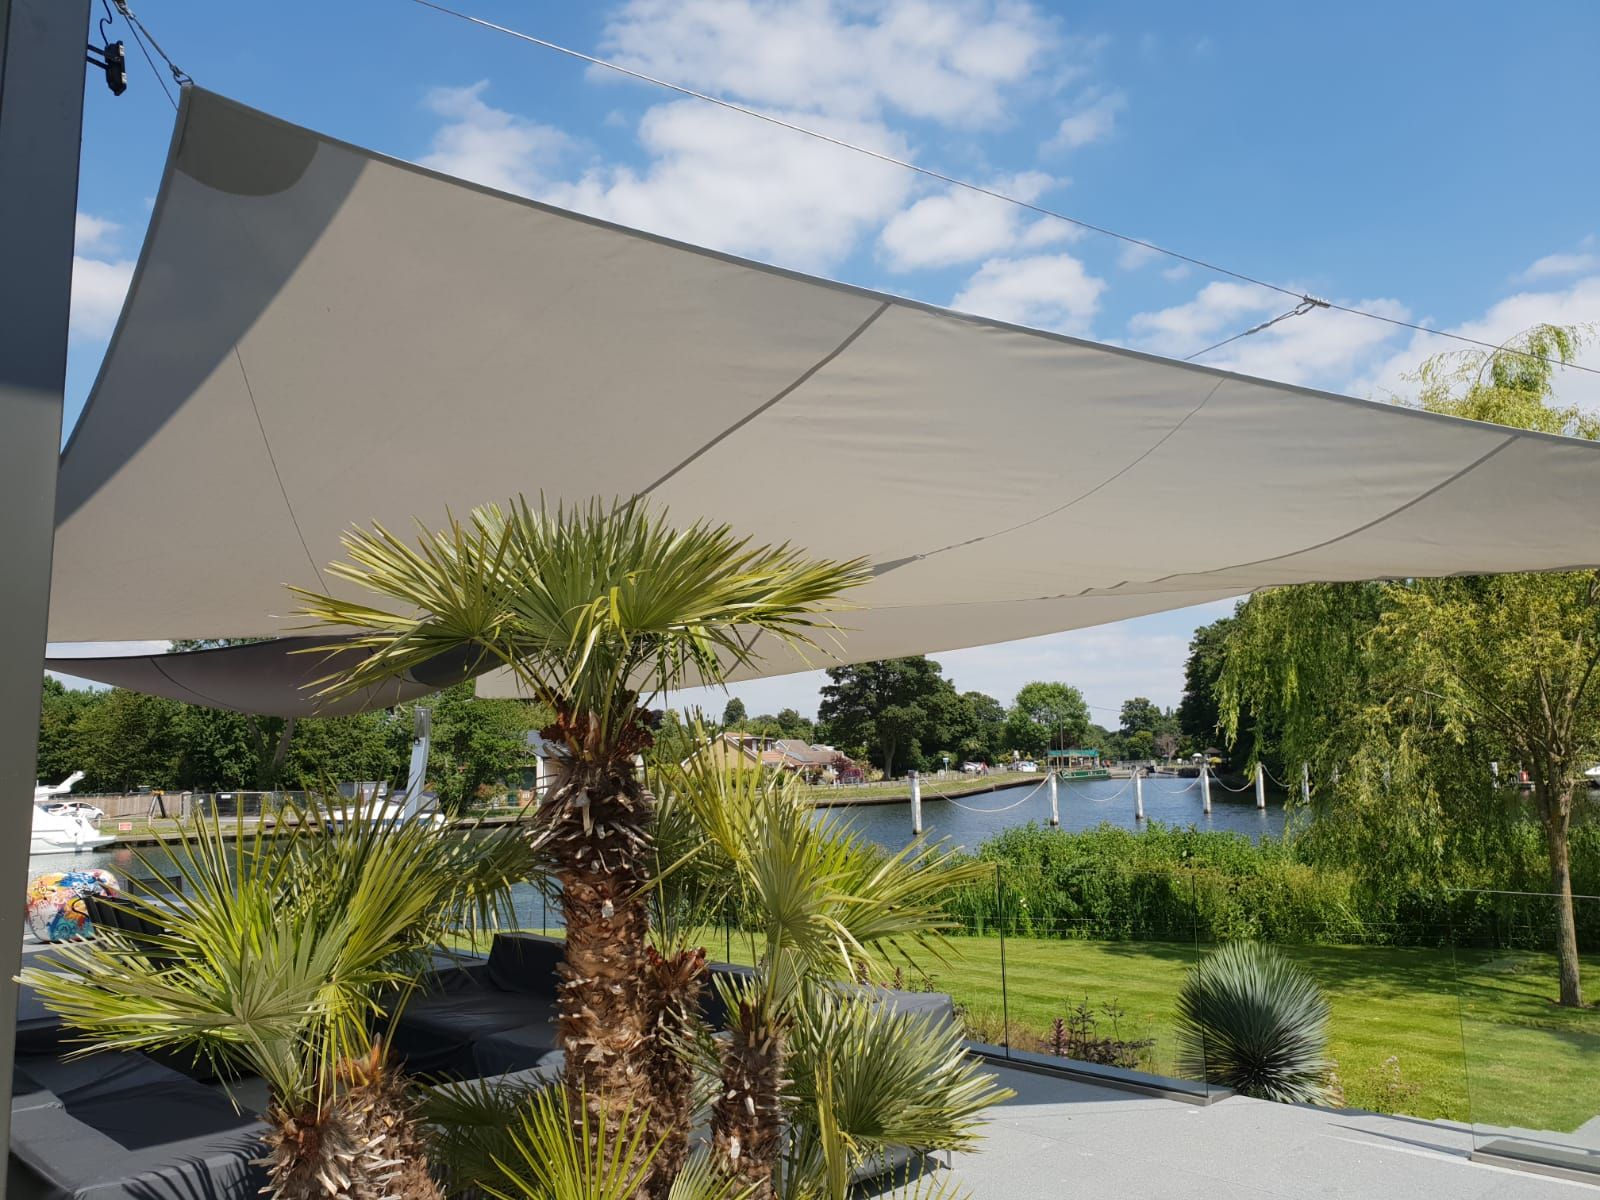 Luxury outdoor sails